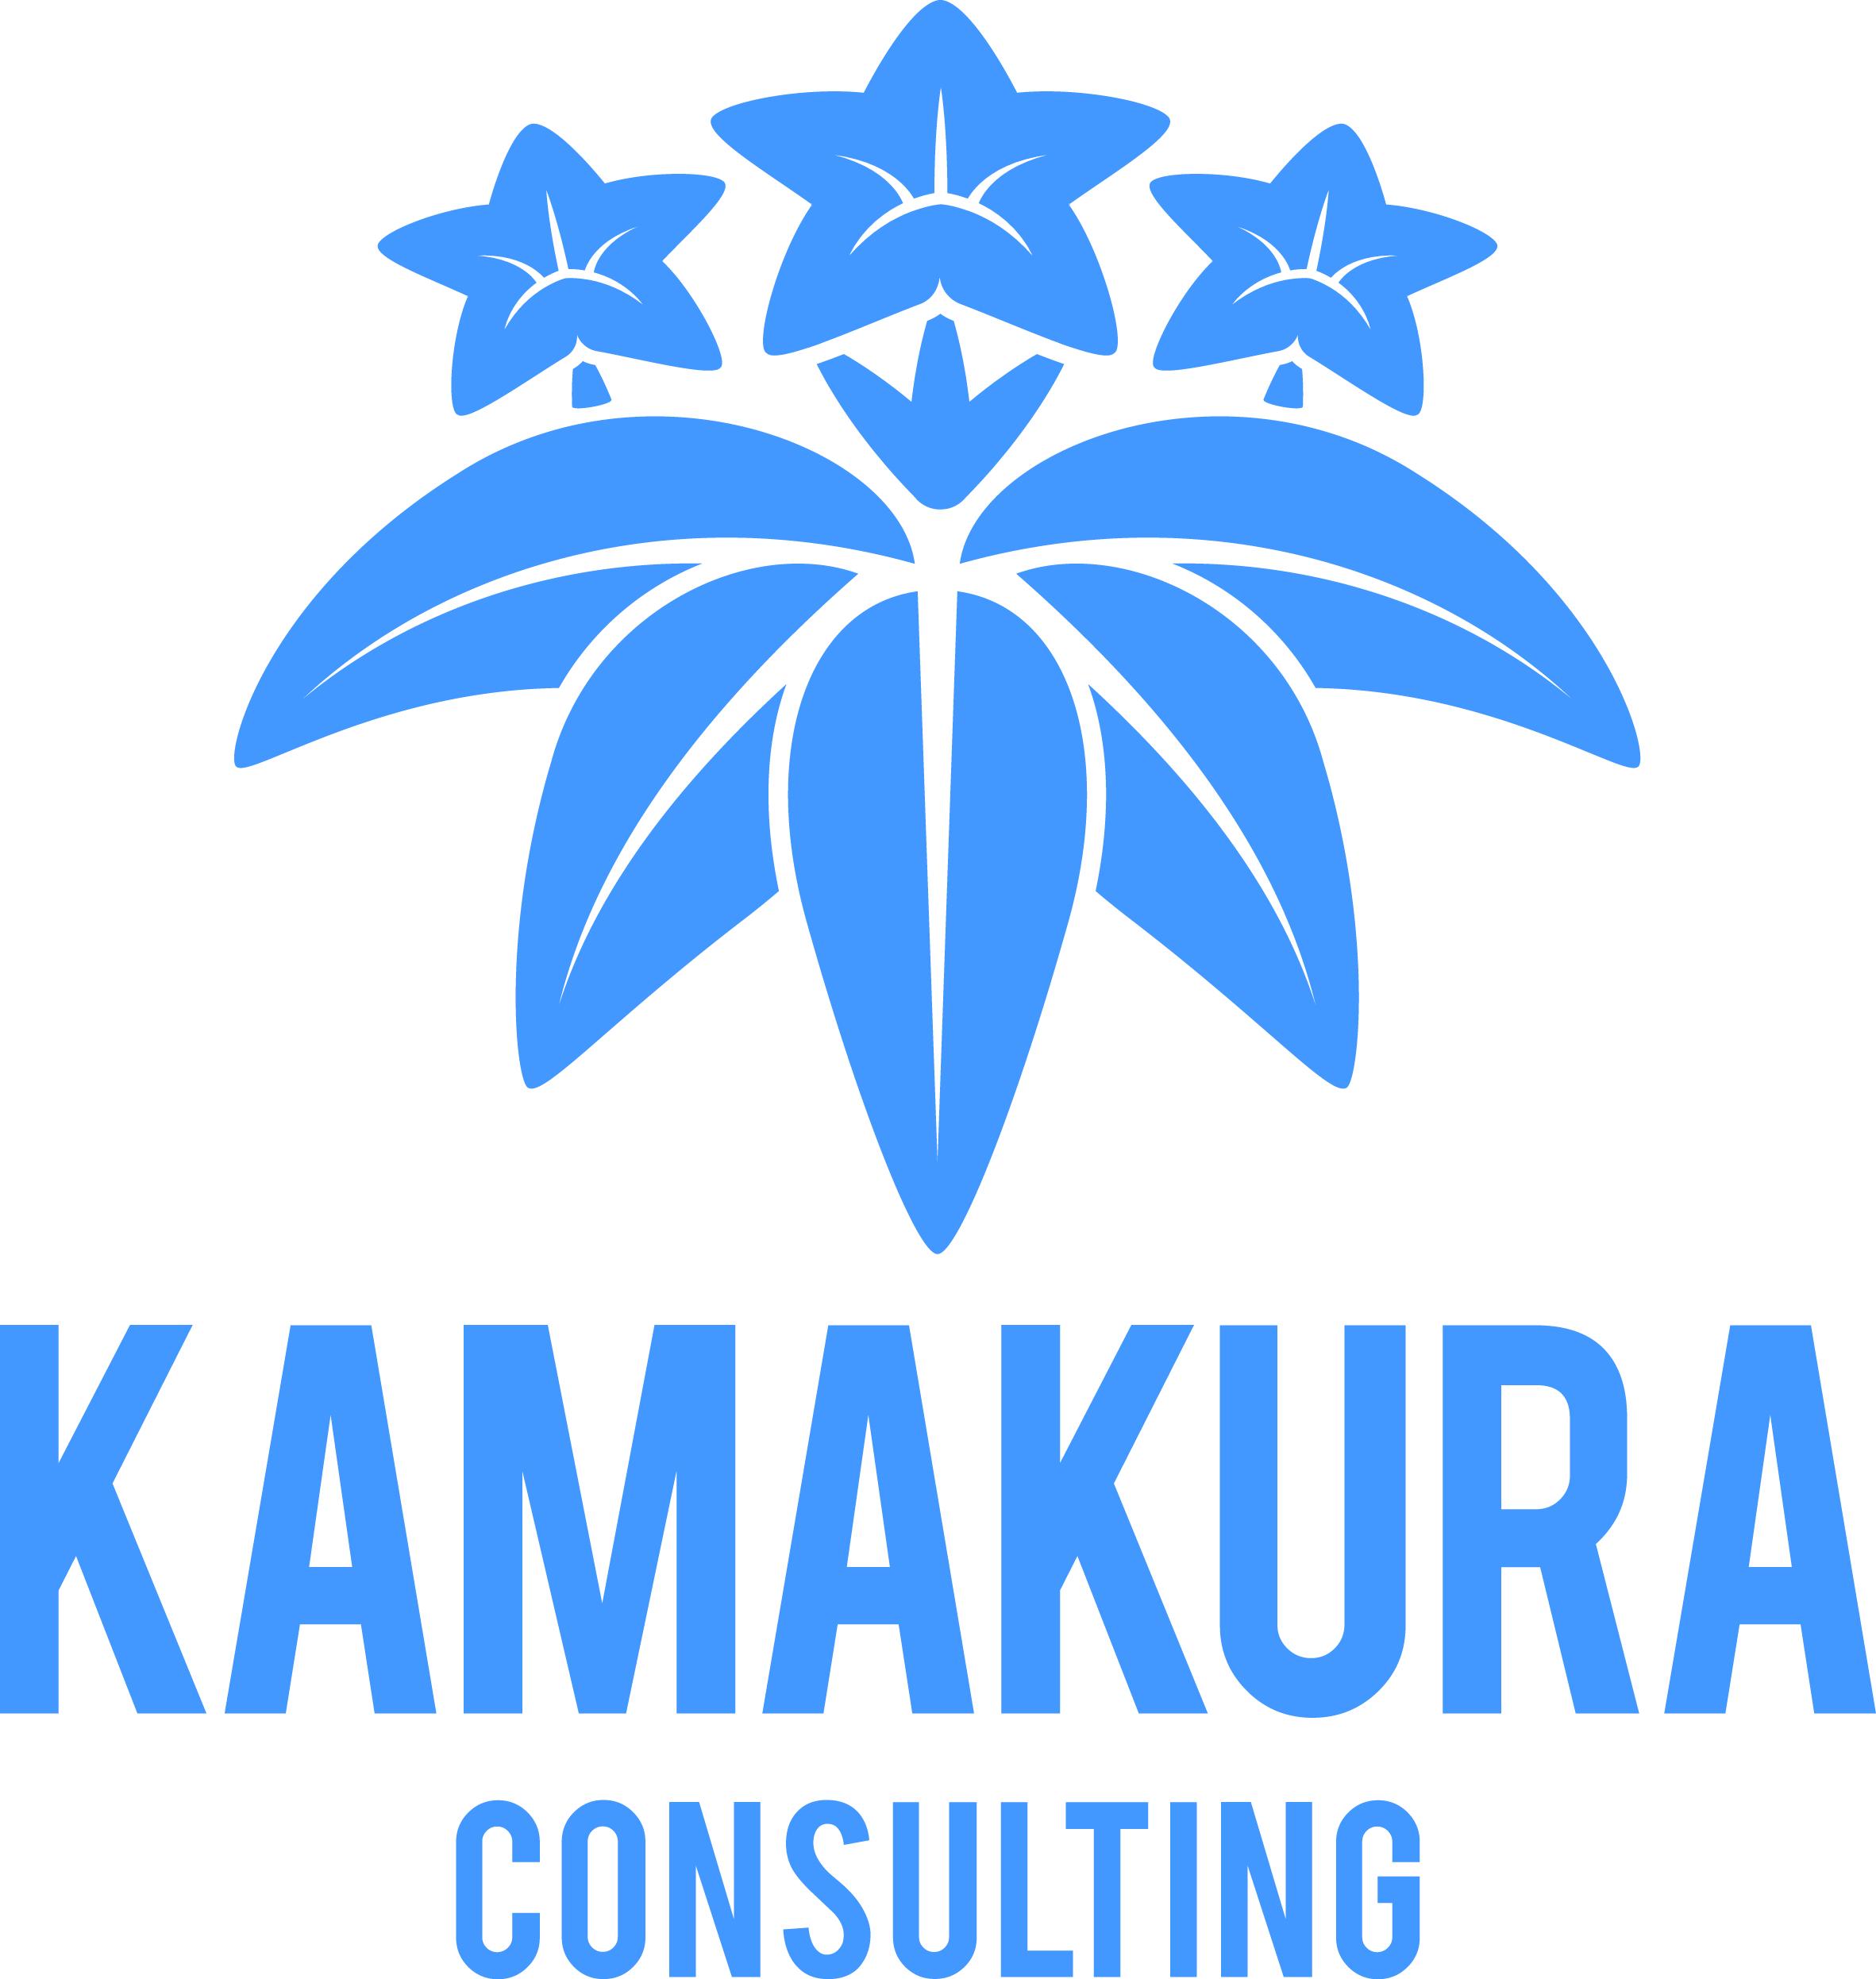 Kamakura blue logo